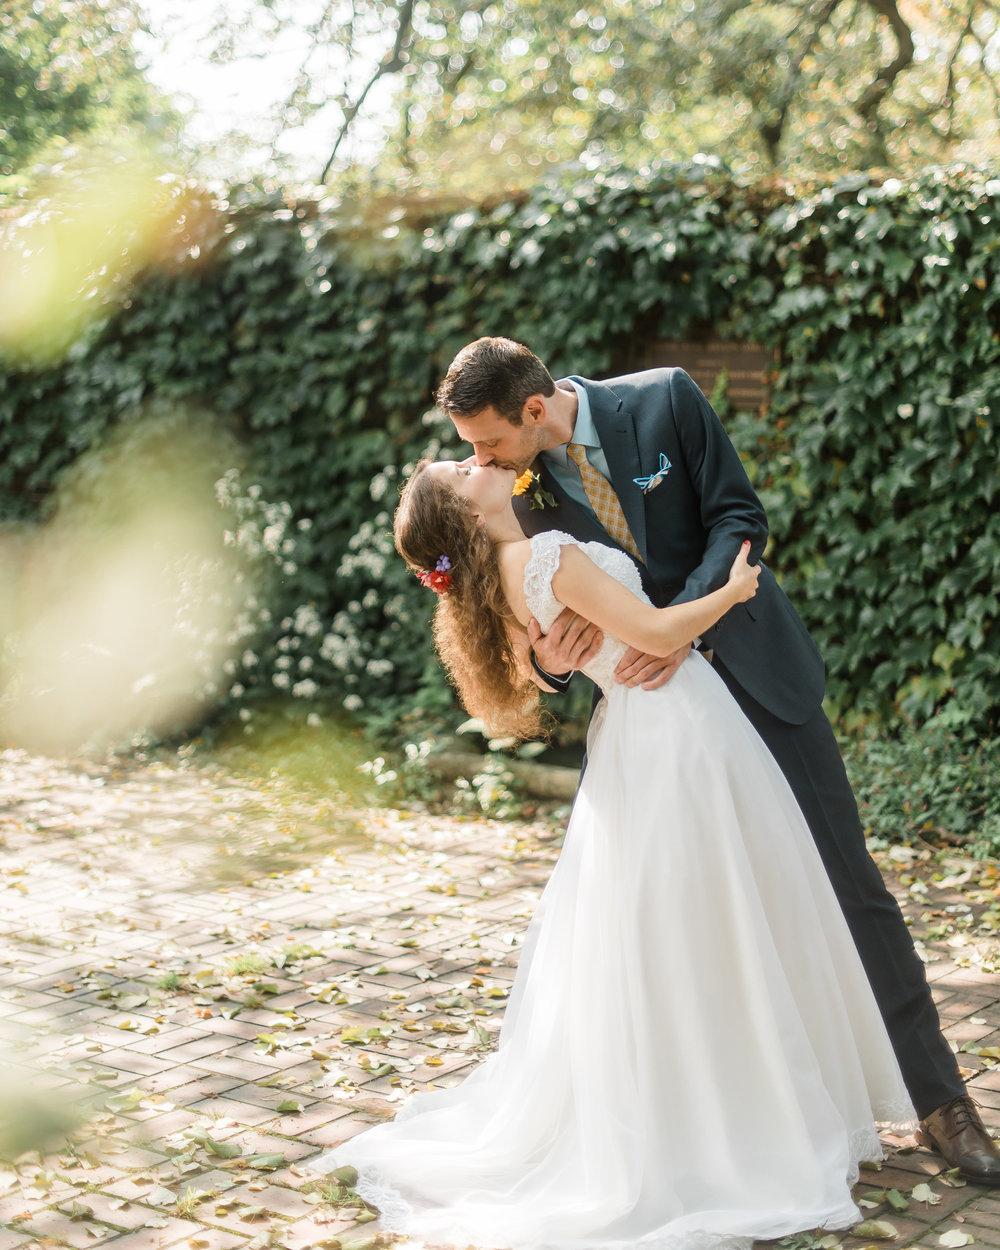 pittsburgh-wedding-photographer-boho-diy-intimate-chic0263.jpg